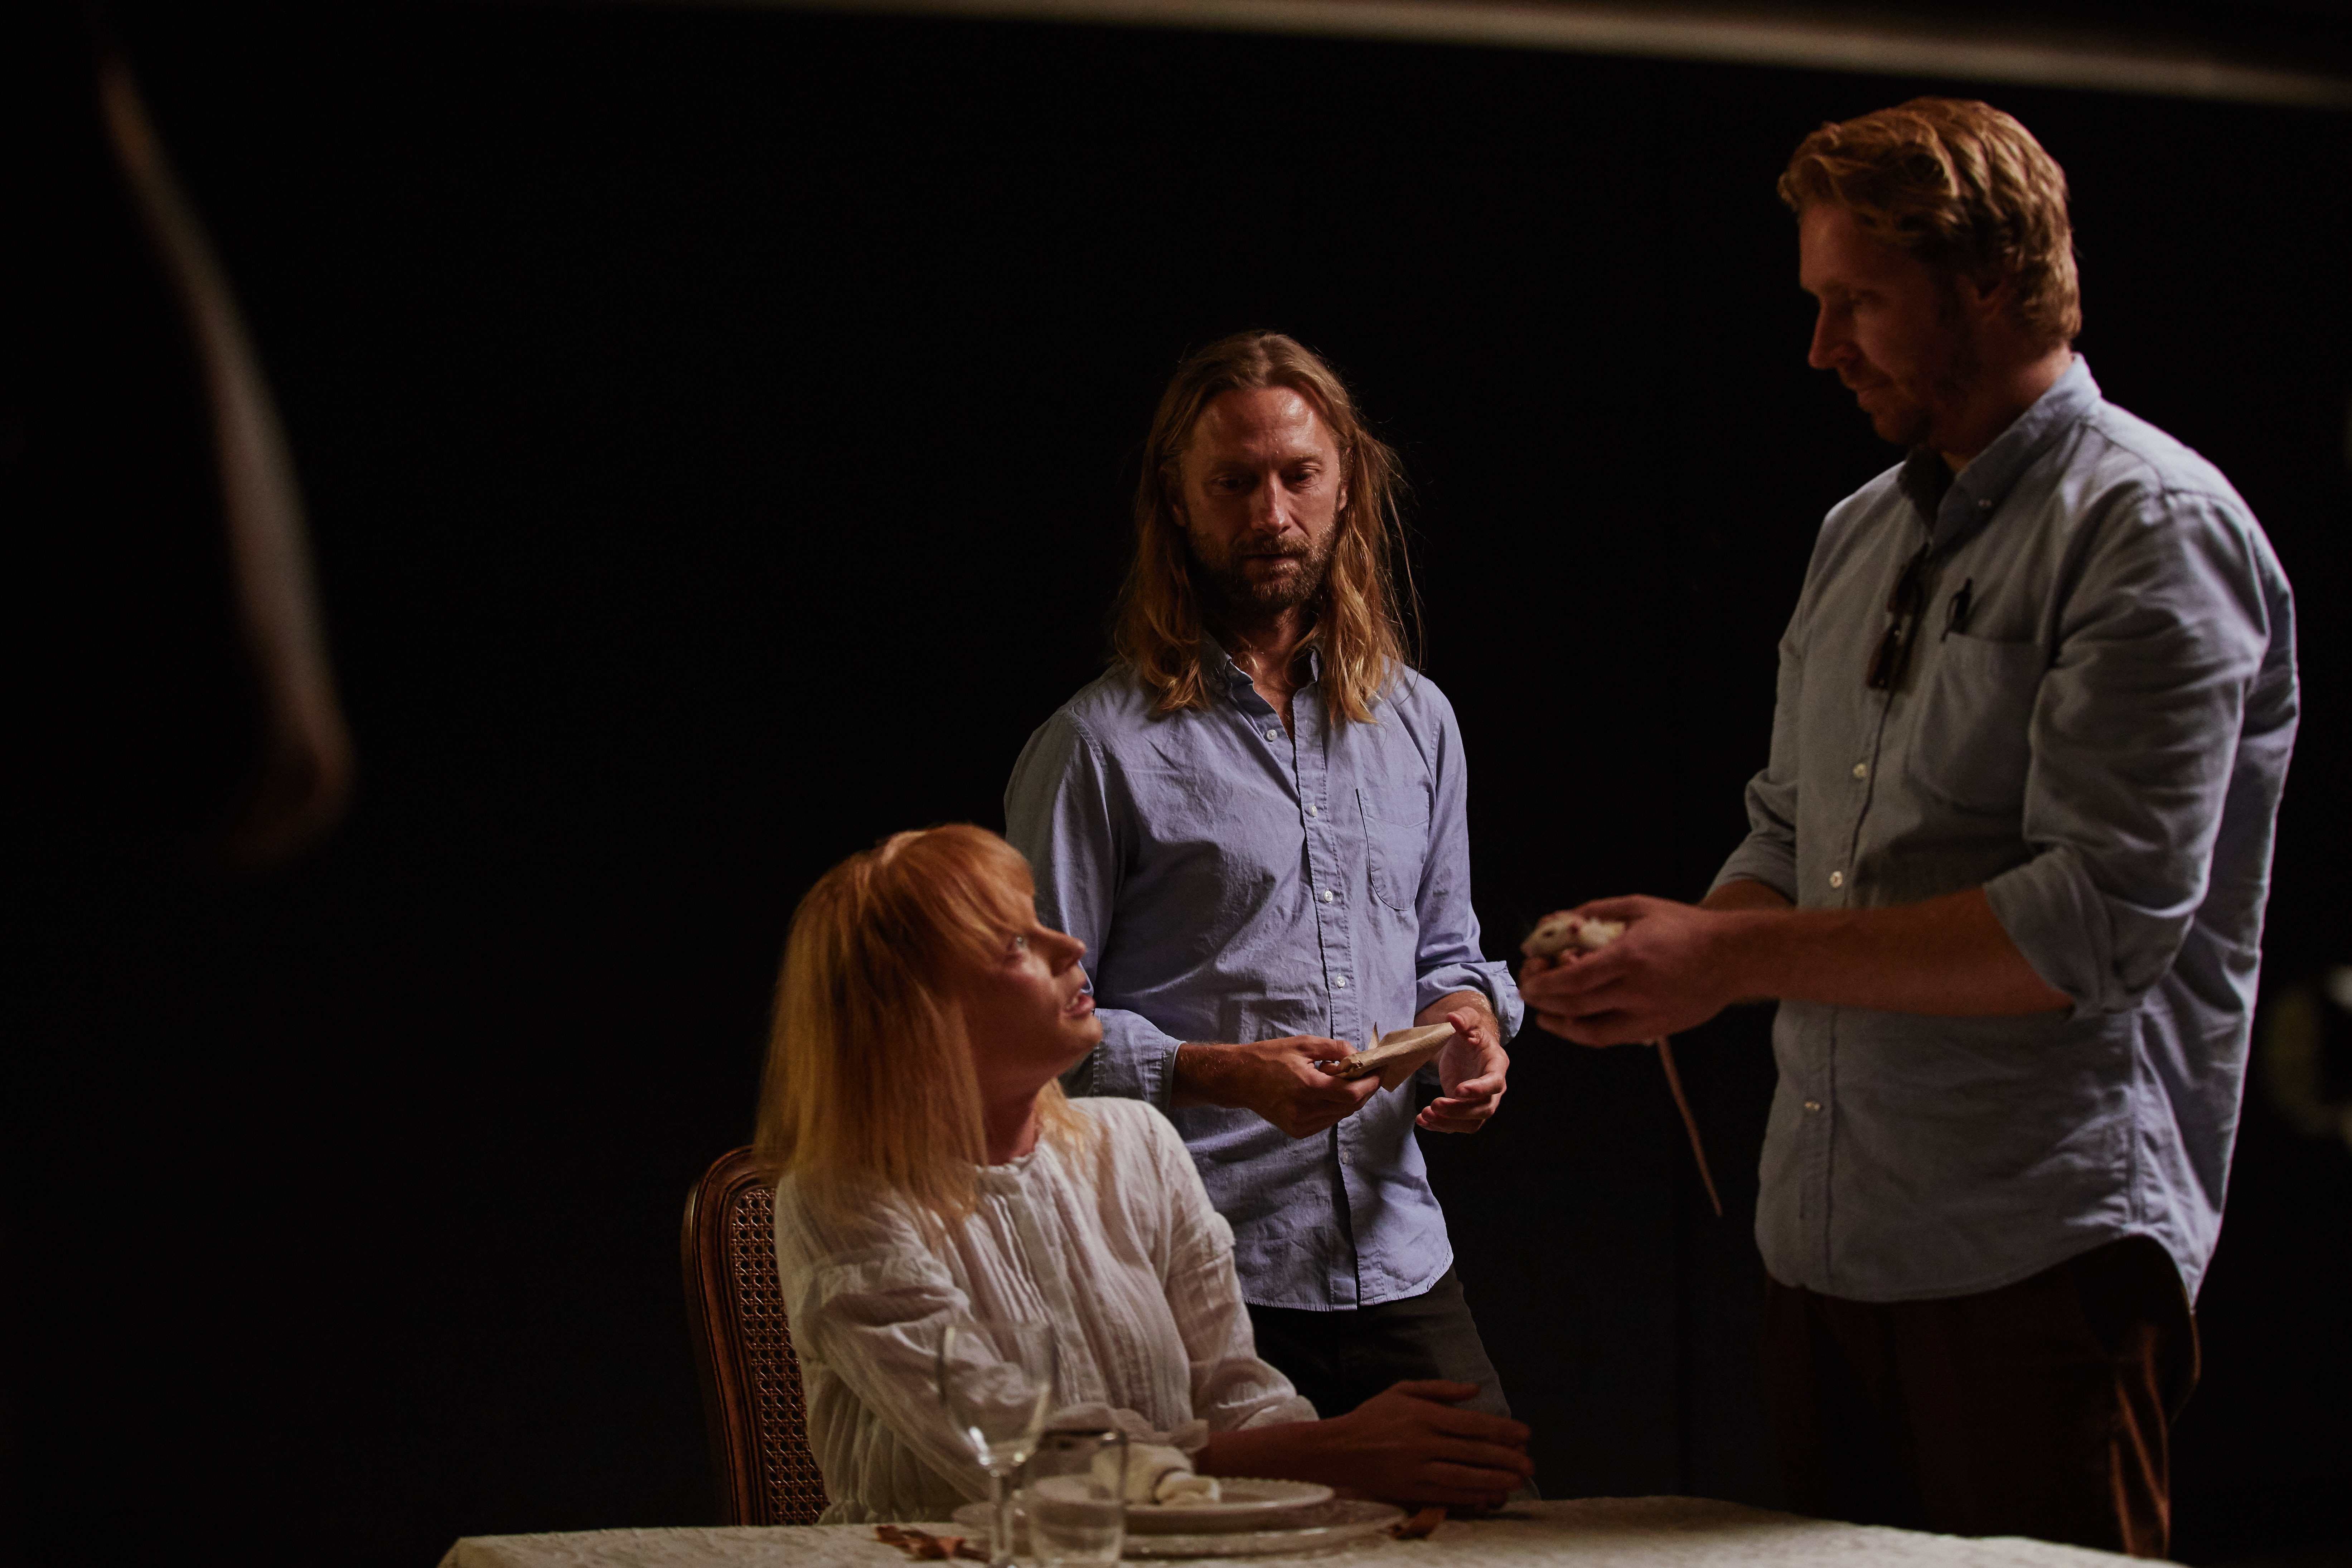 Miniac Films Director Benjamin Kutsko's modern take on San Fermin